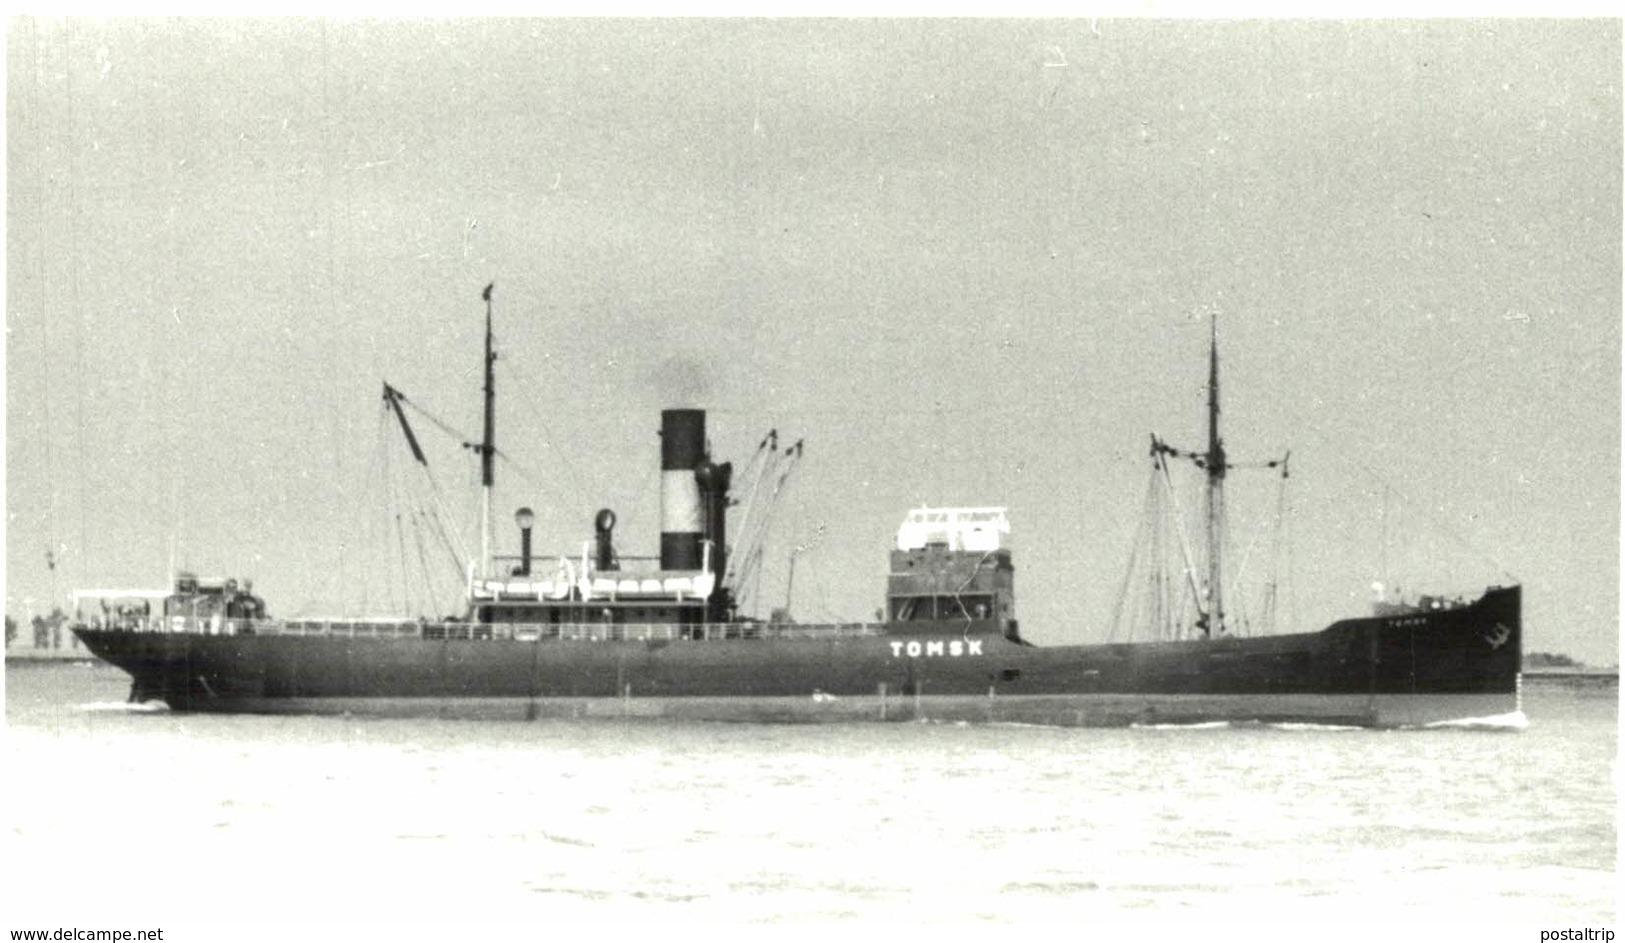 TOMSK 13,5 X 9 Cm  BARCO, BATEAU, SHIP  DINAMARCA, DENMARK, DANEMARK - Barcos